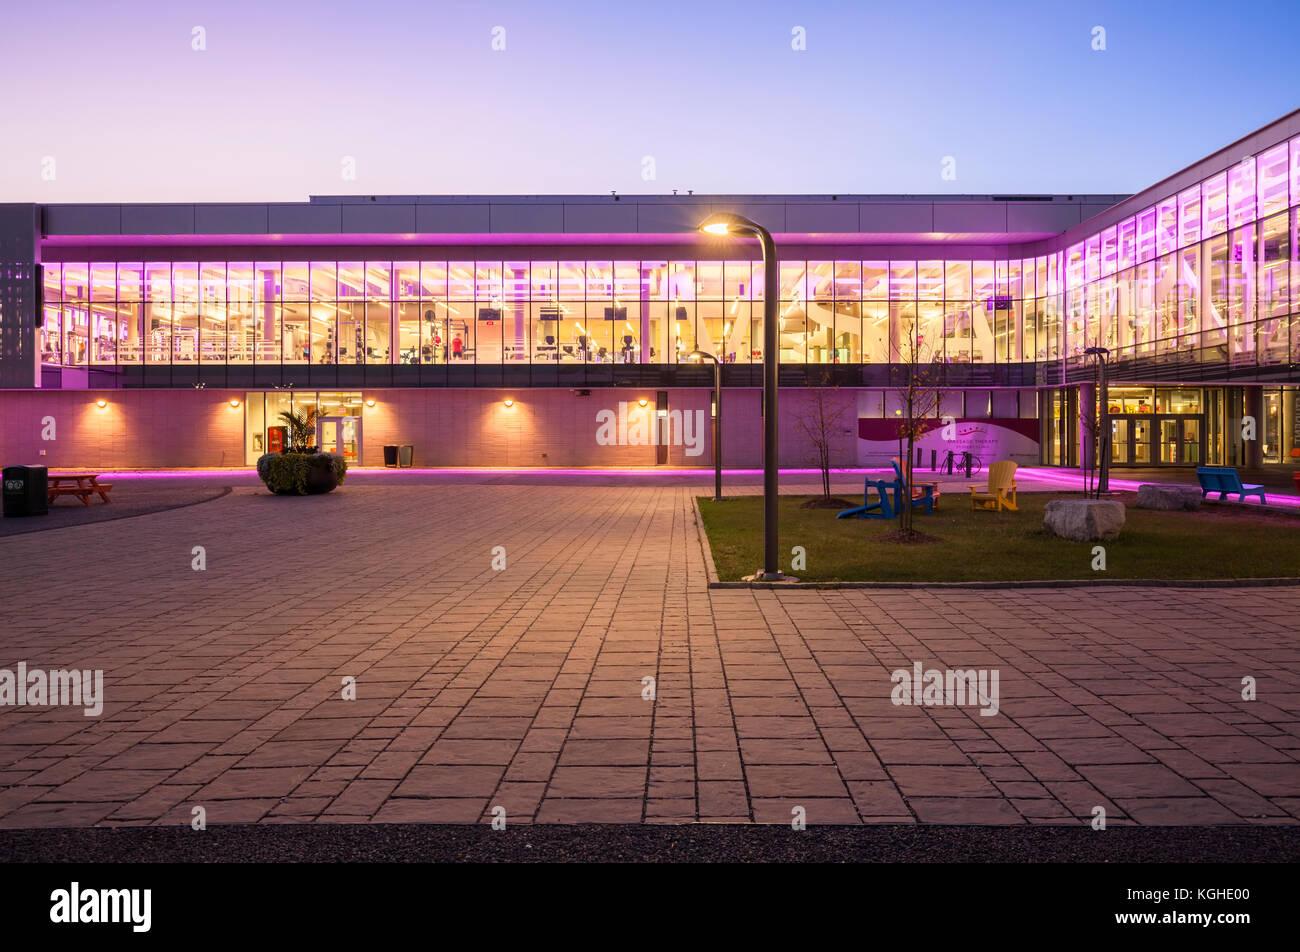 Mohawk College S Fennel Campus At Dusk In Hamilton Ontario Canada Stock Photo Alamy